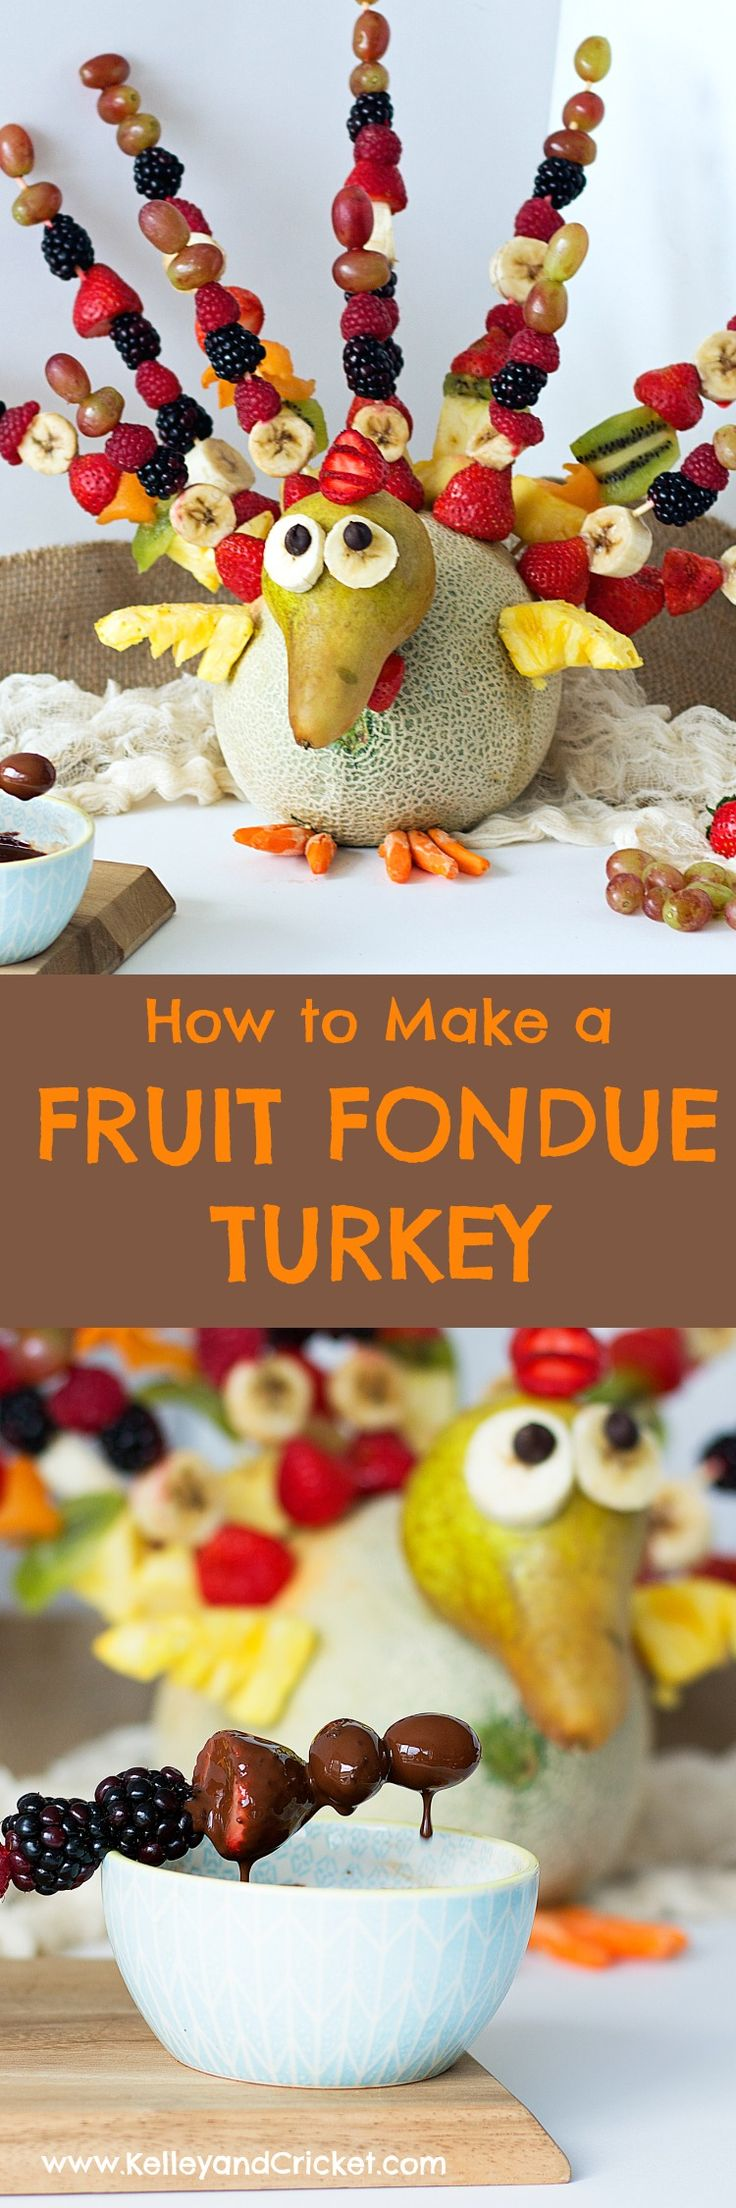 How to make a FRUIT TURKEY with CHOCOLATE FONDUE!